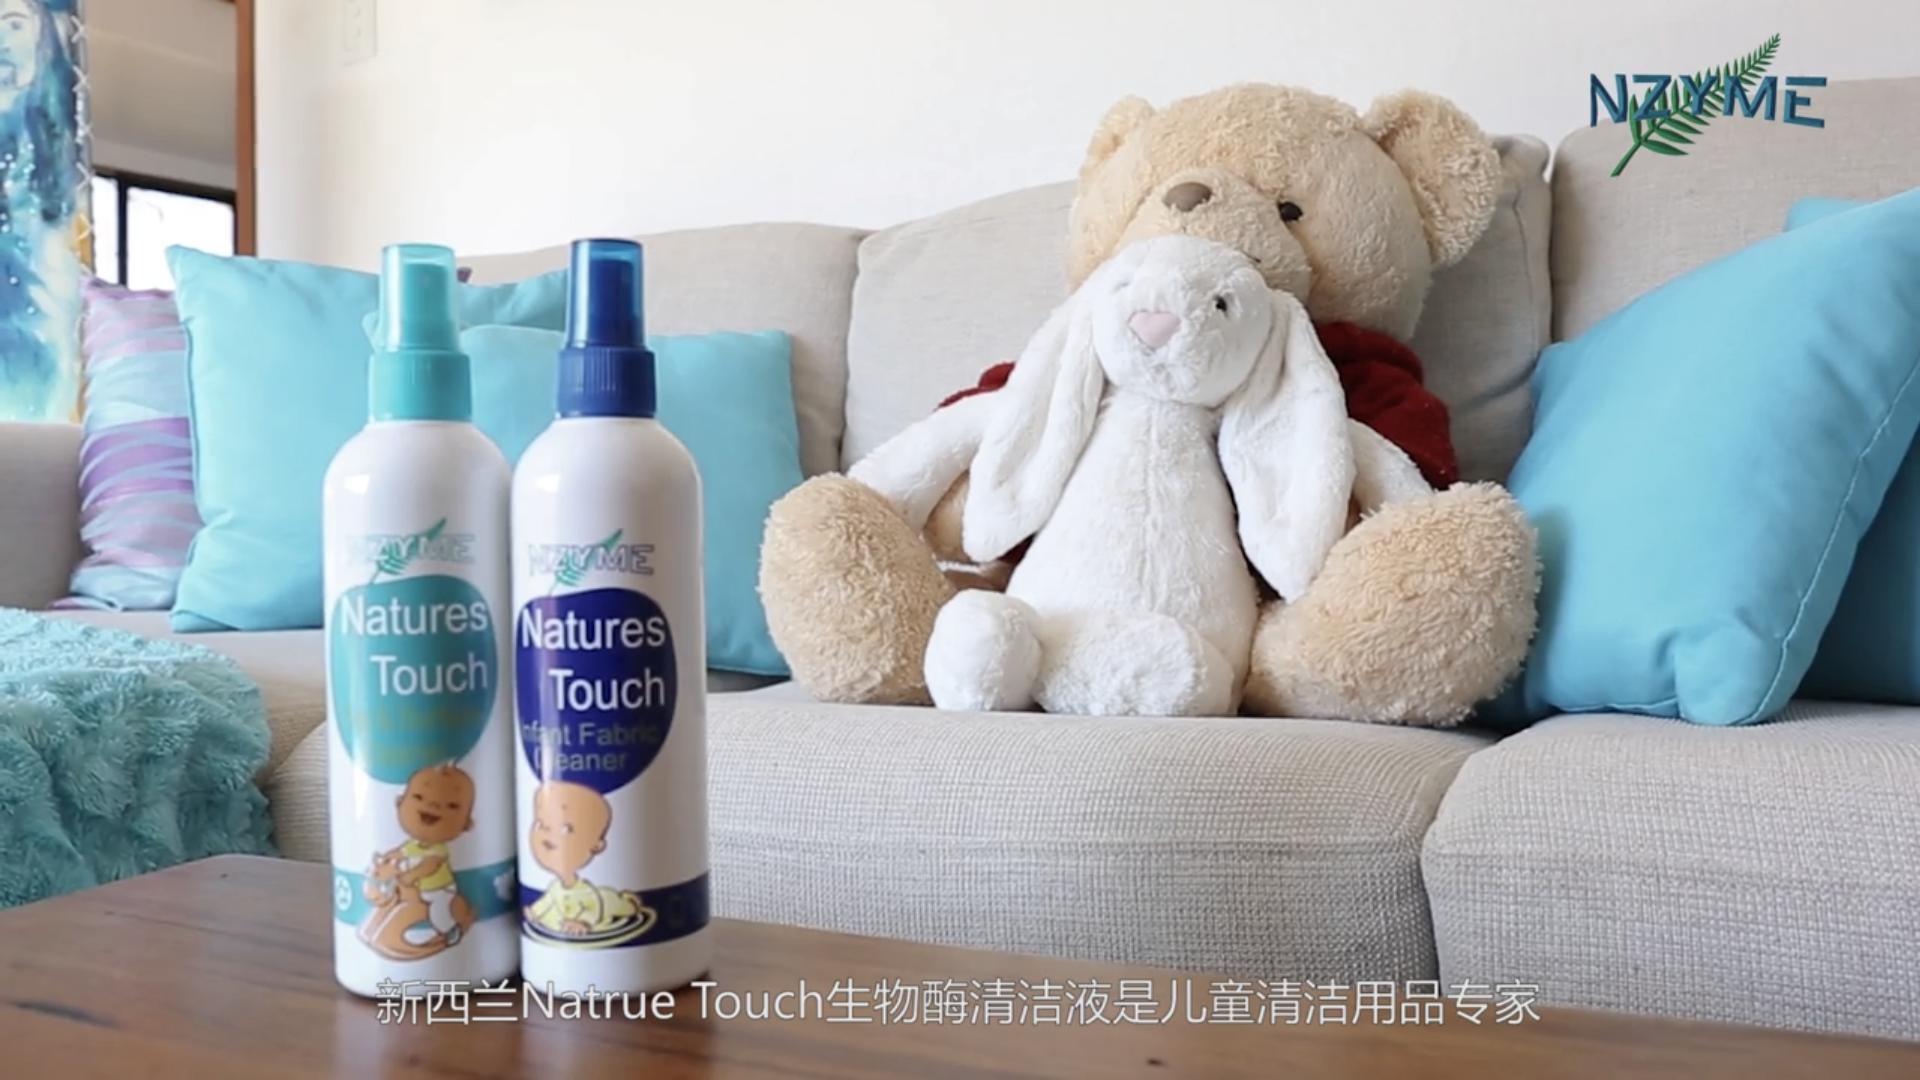 nzyme婴儿用品广告